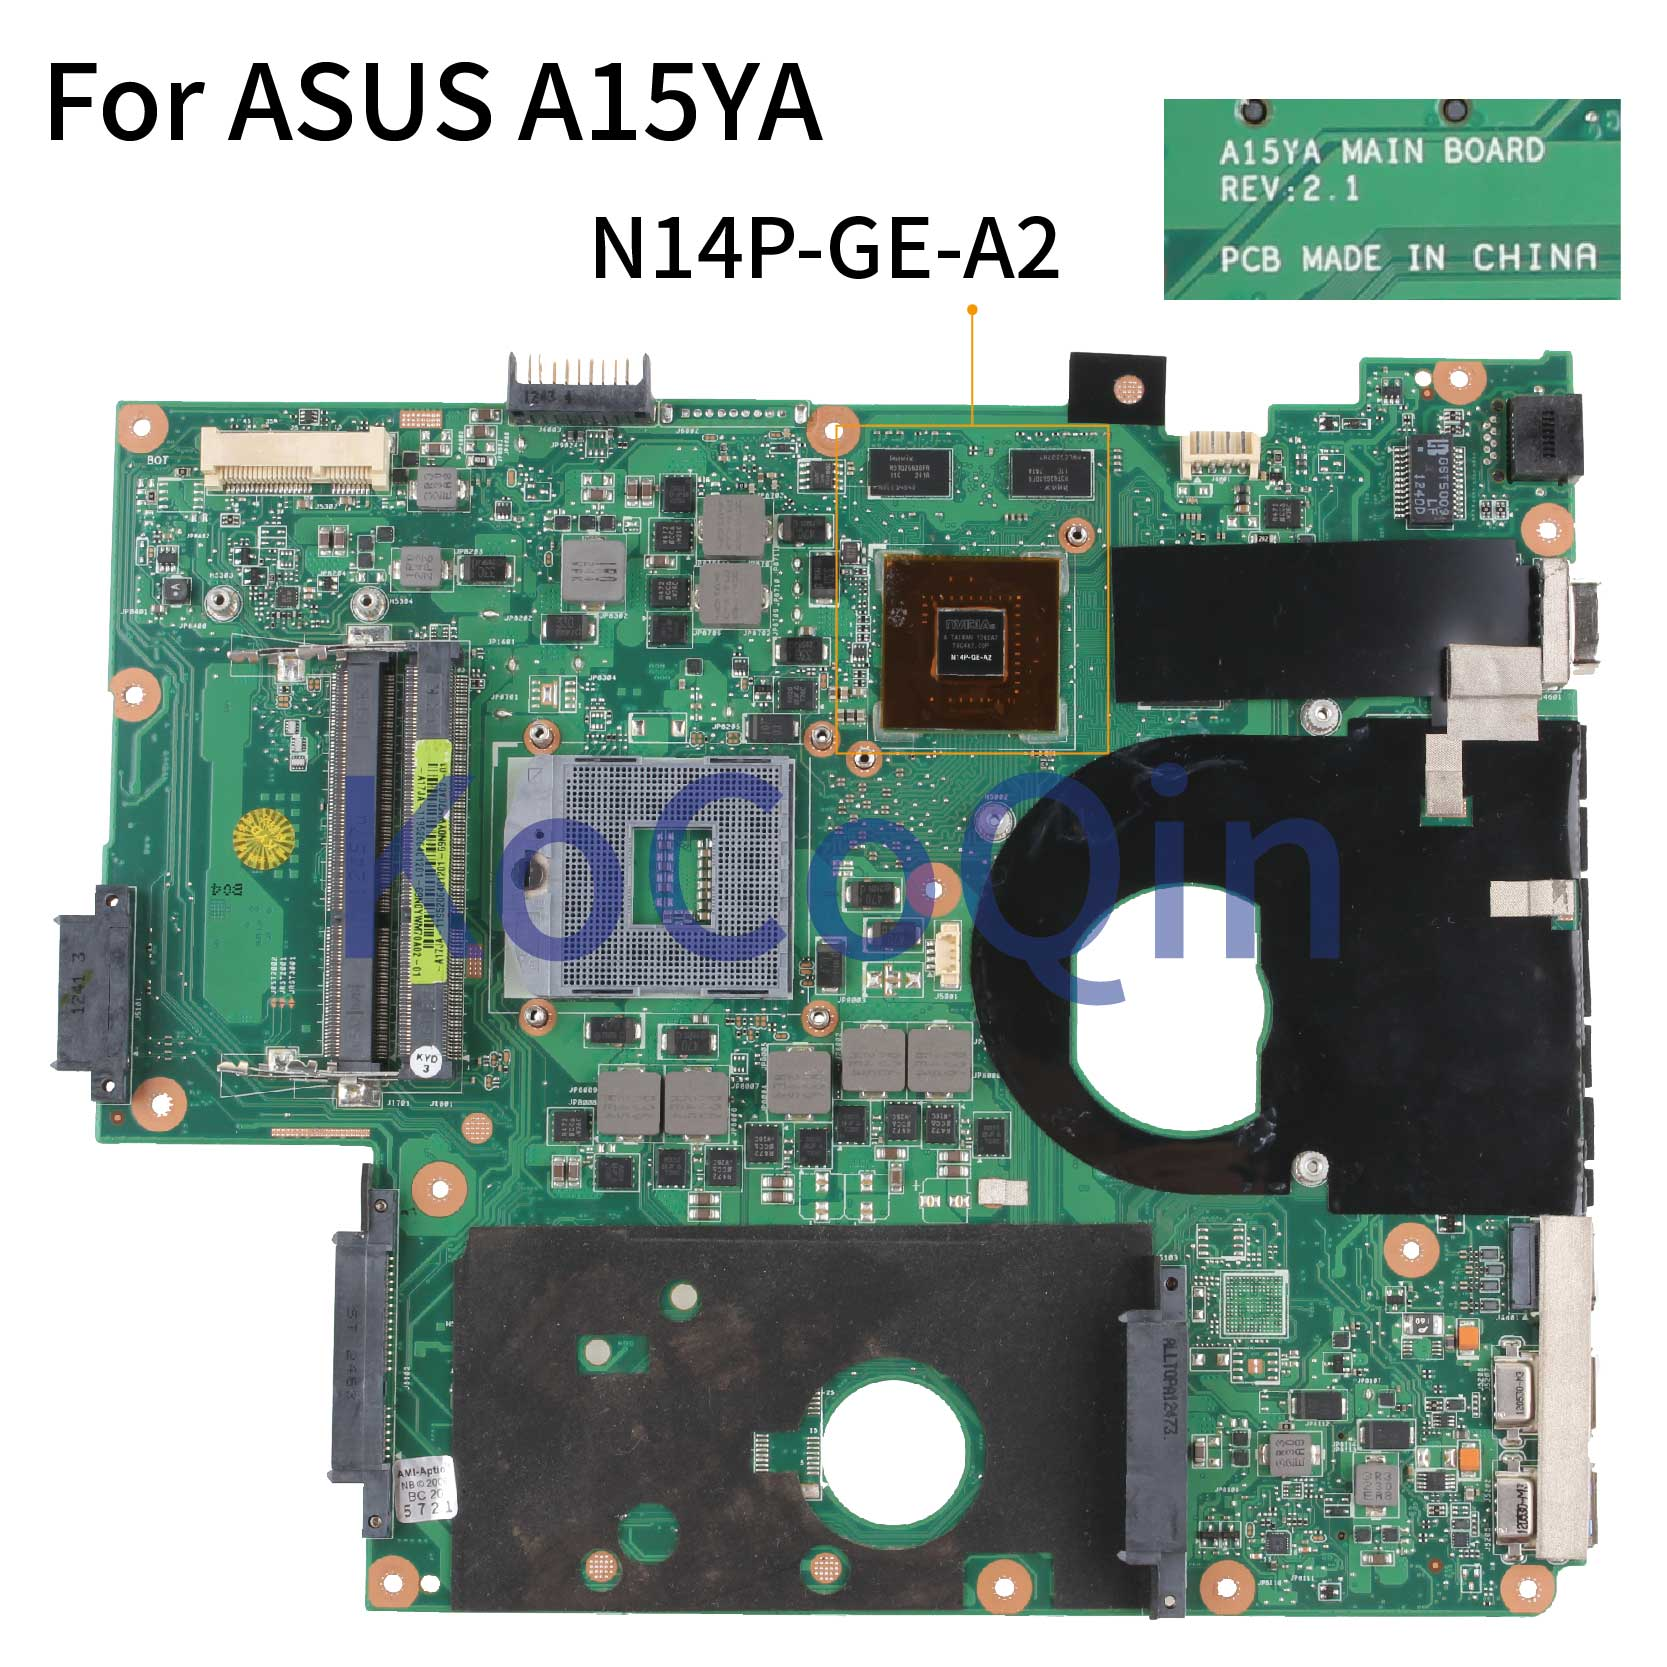 KoCoQin Laptop Motherboard For ASUS A15YA REV:2.1 SJTNV Mainboard